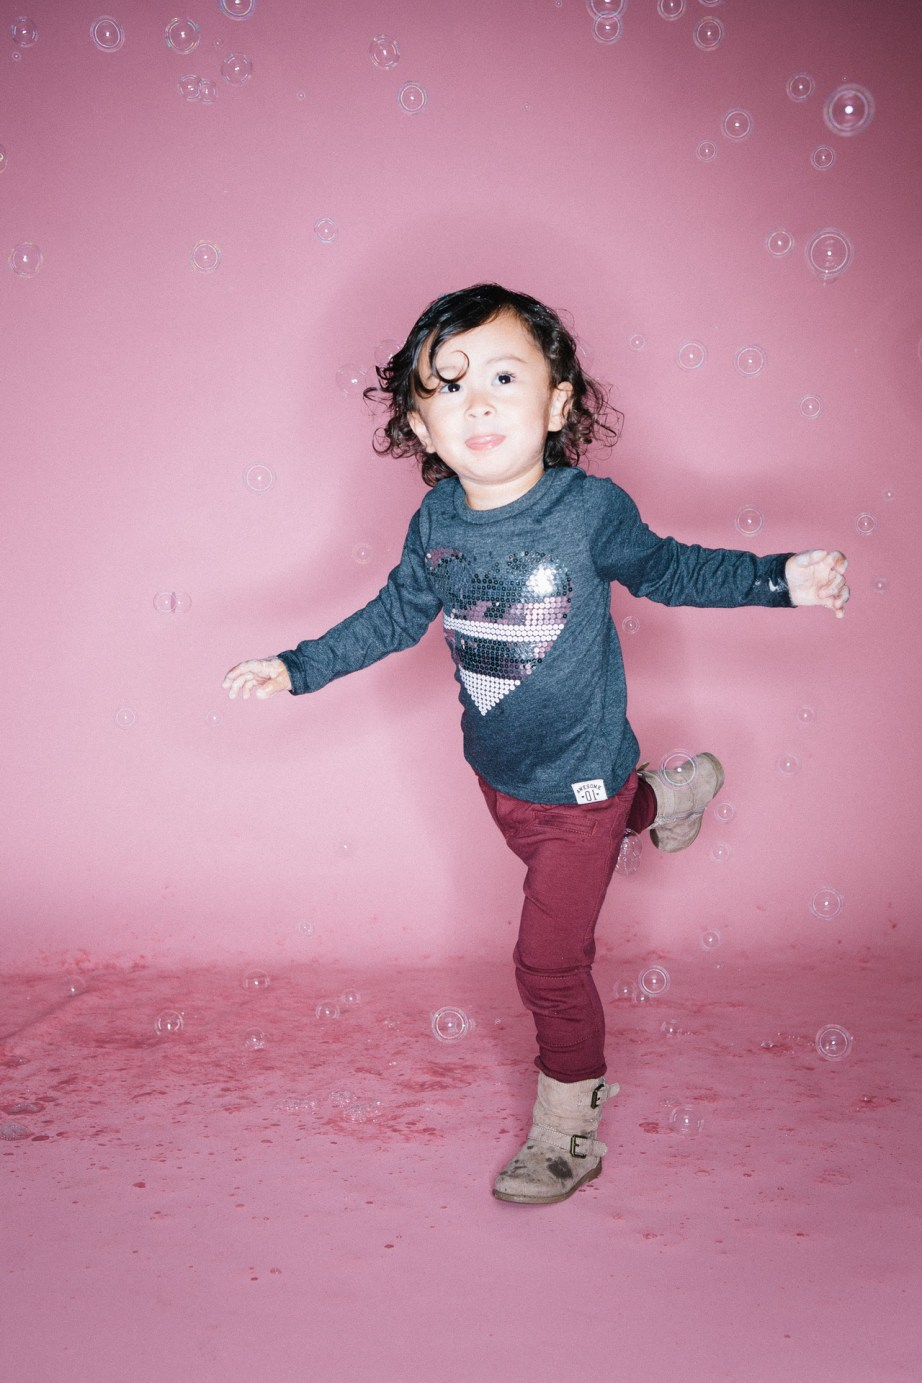 kids in bubbles photography studio nicole caldwell 09